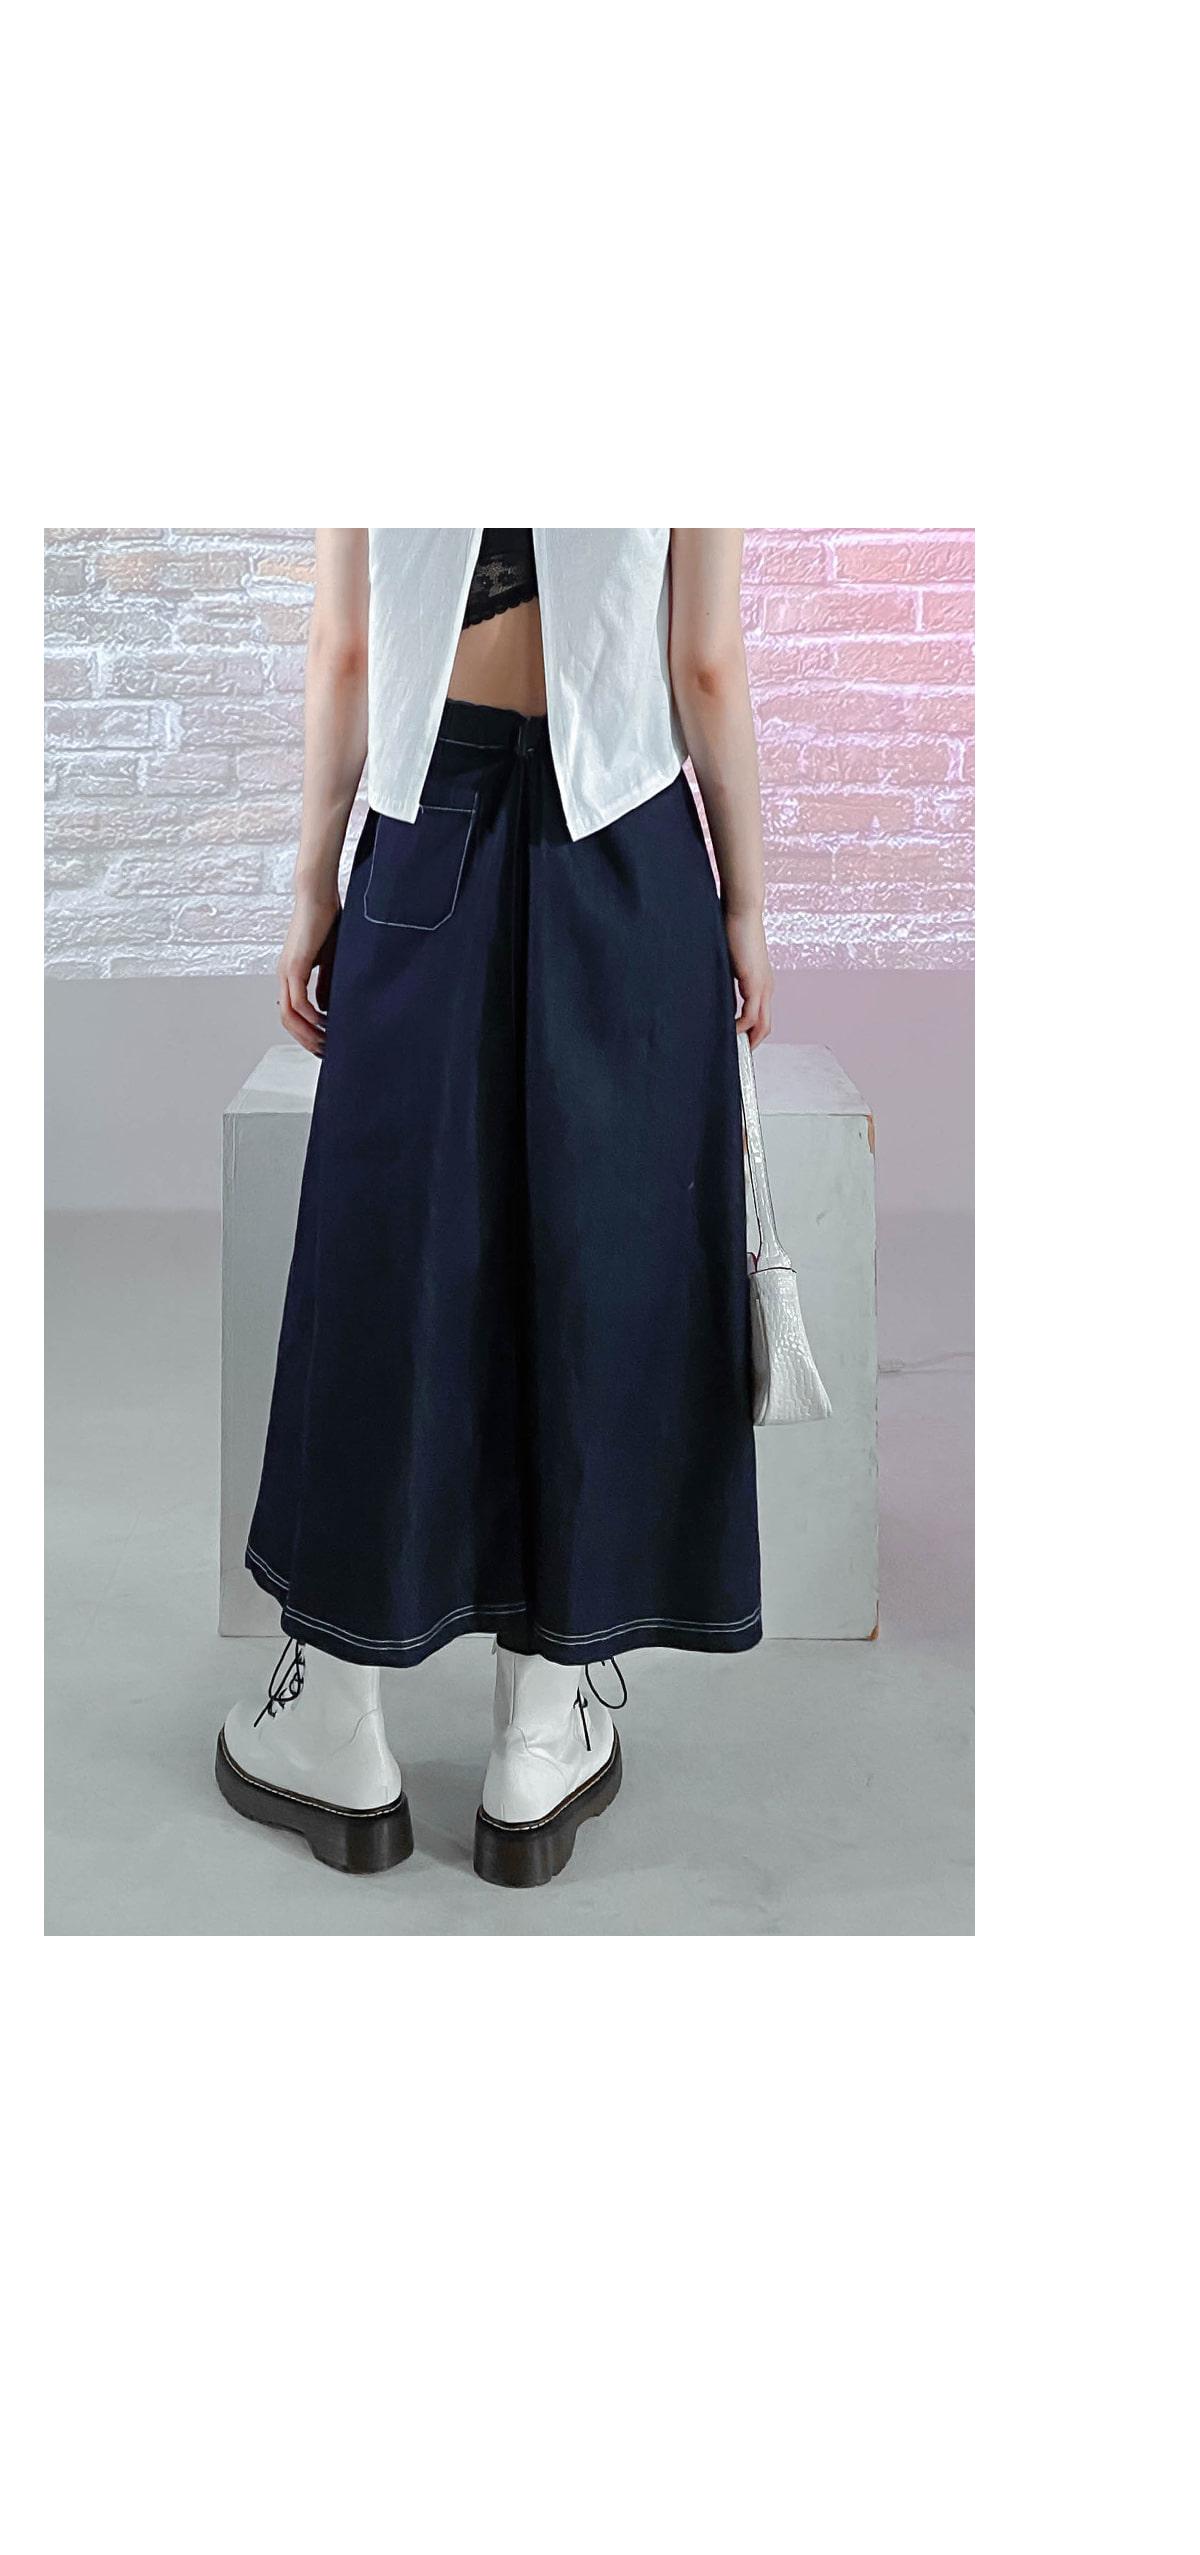 Raw Tie Long Skirt